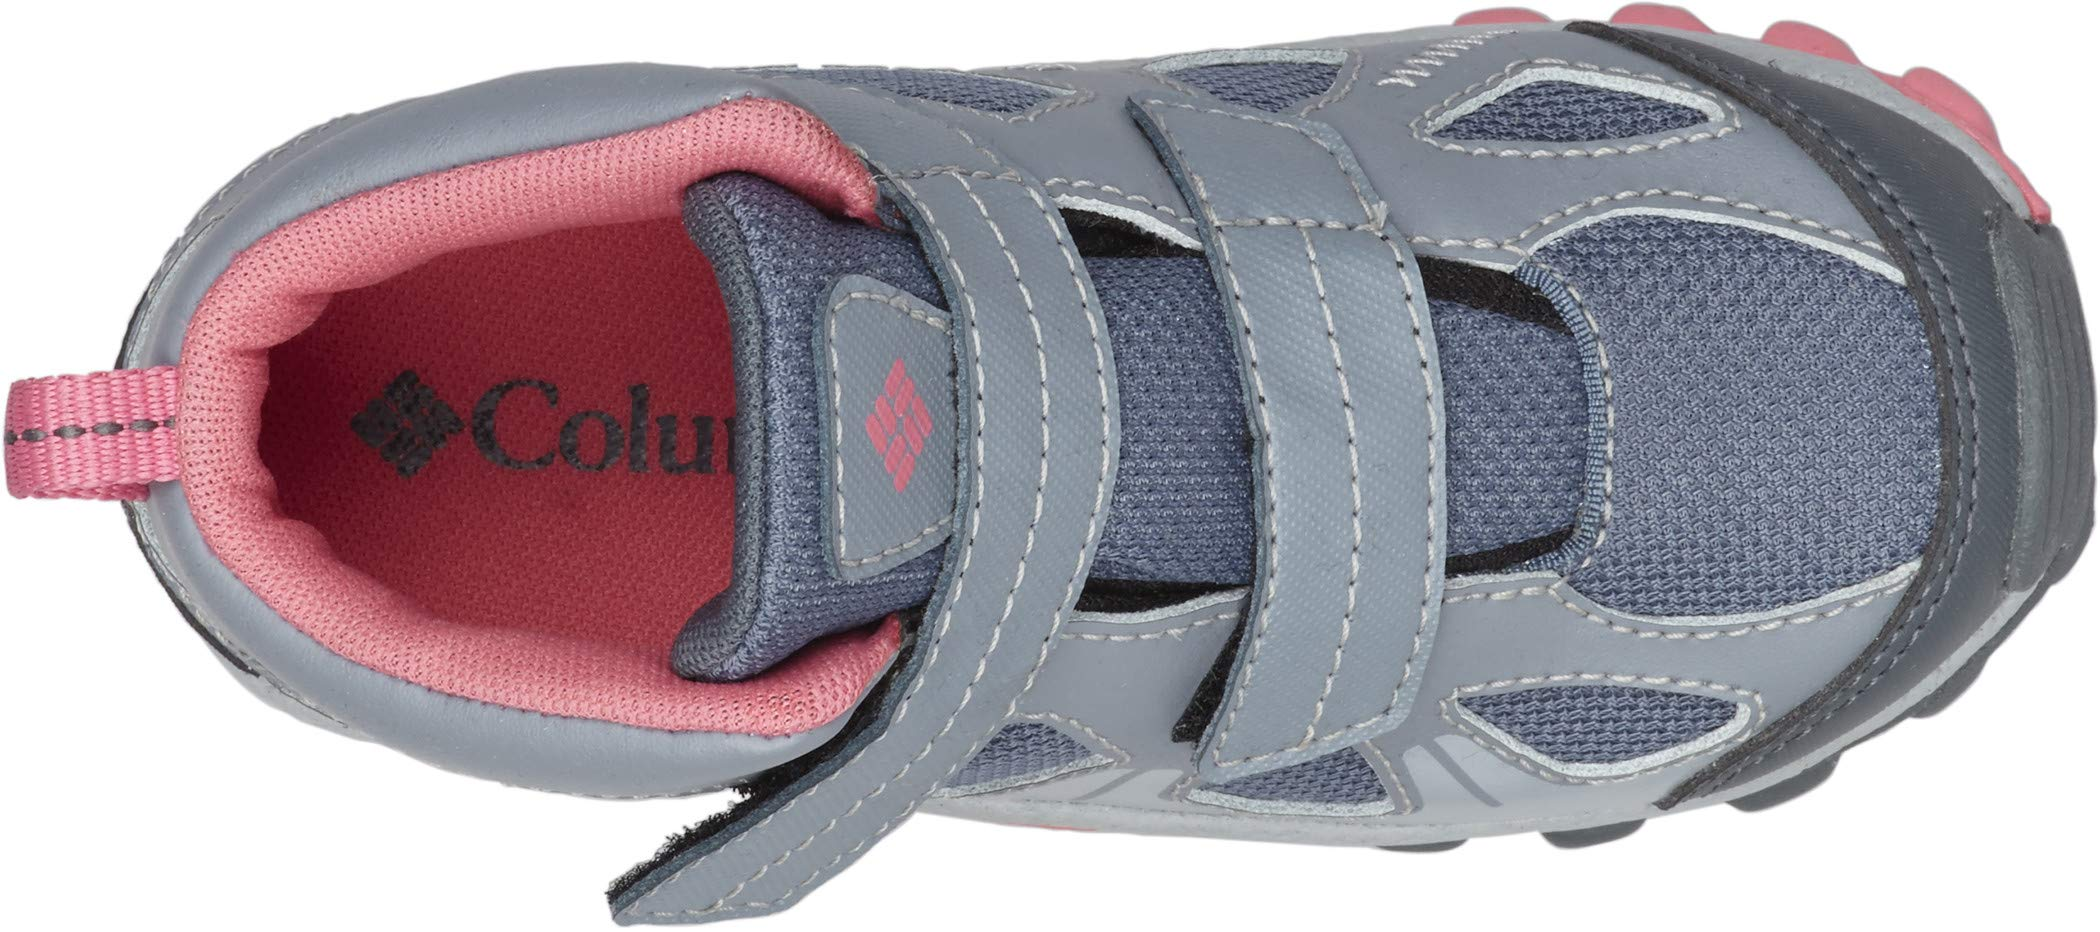 Columbia Unisex Kids Peakfreak™ XCRSN Mid Wp Hiking Shoes 2